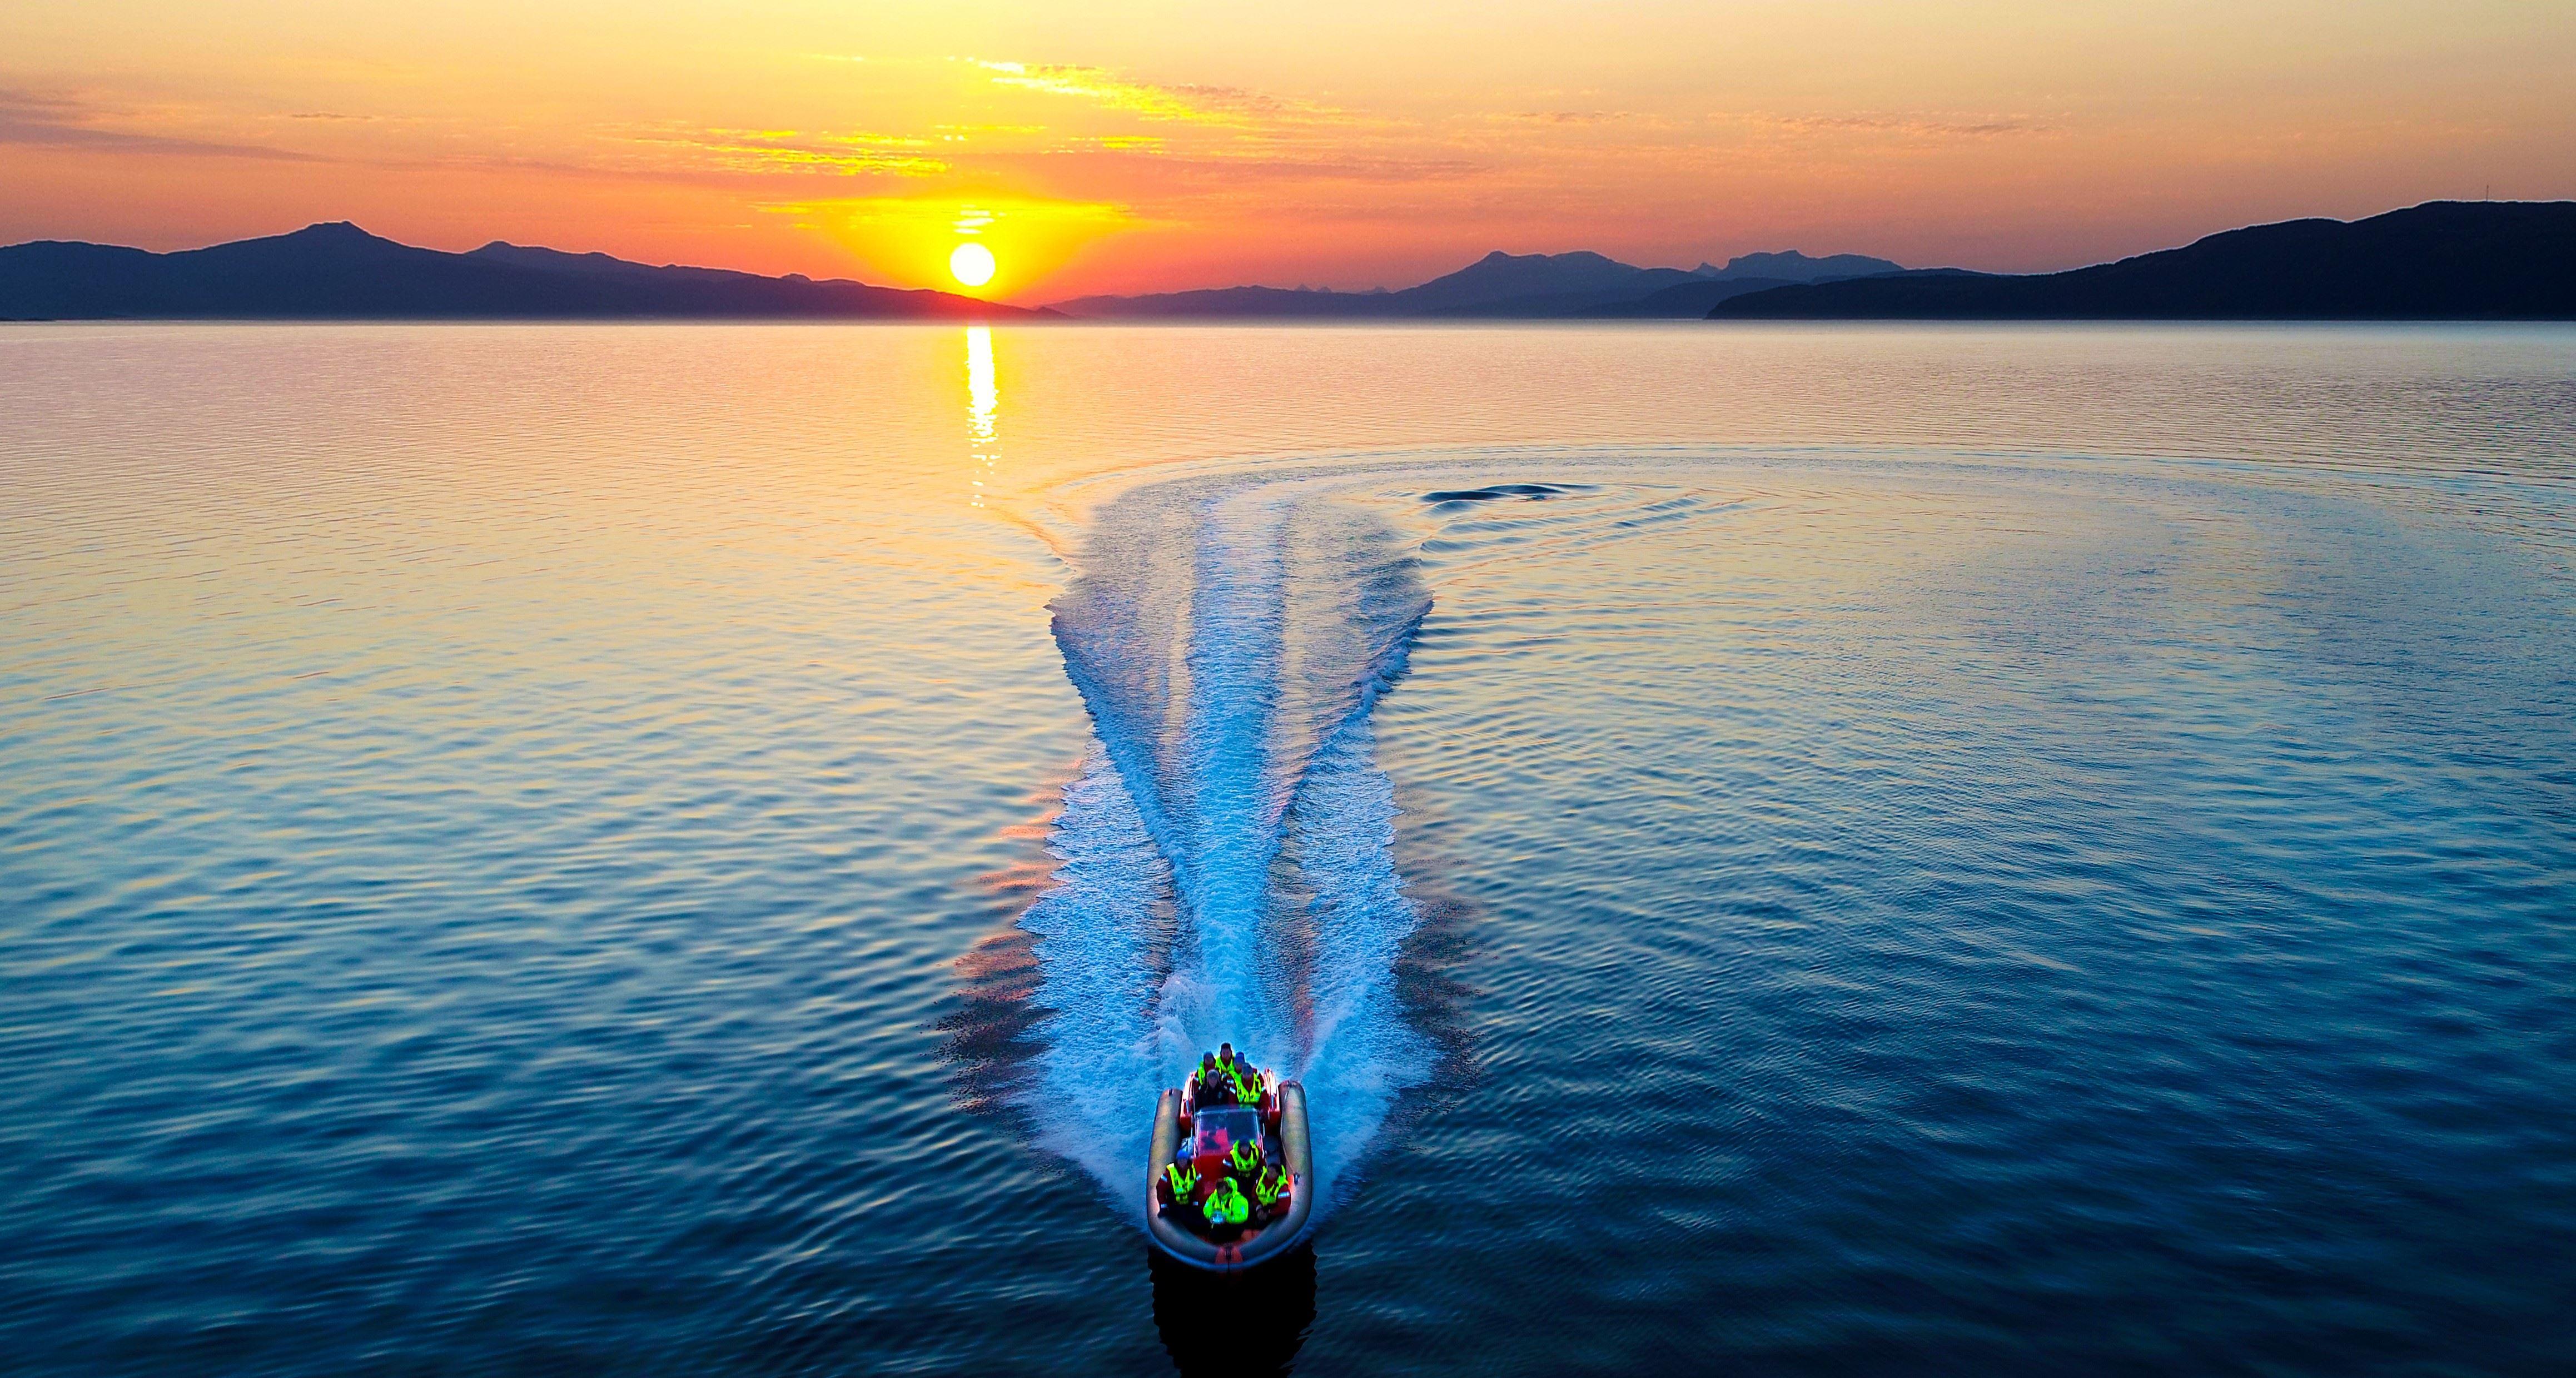 Michael Ulriksen, Explore the Ofot fjord with a RIB Safari